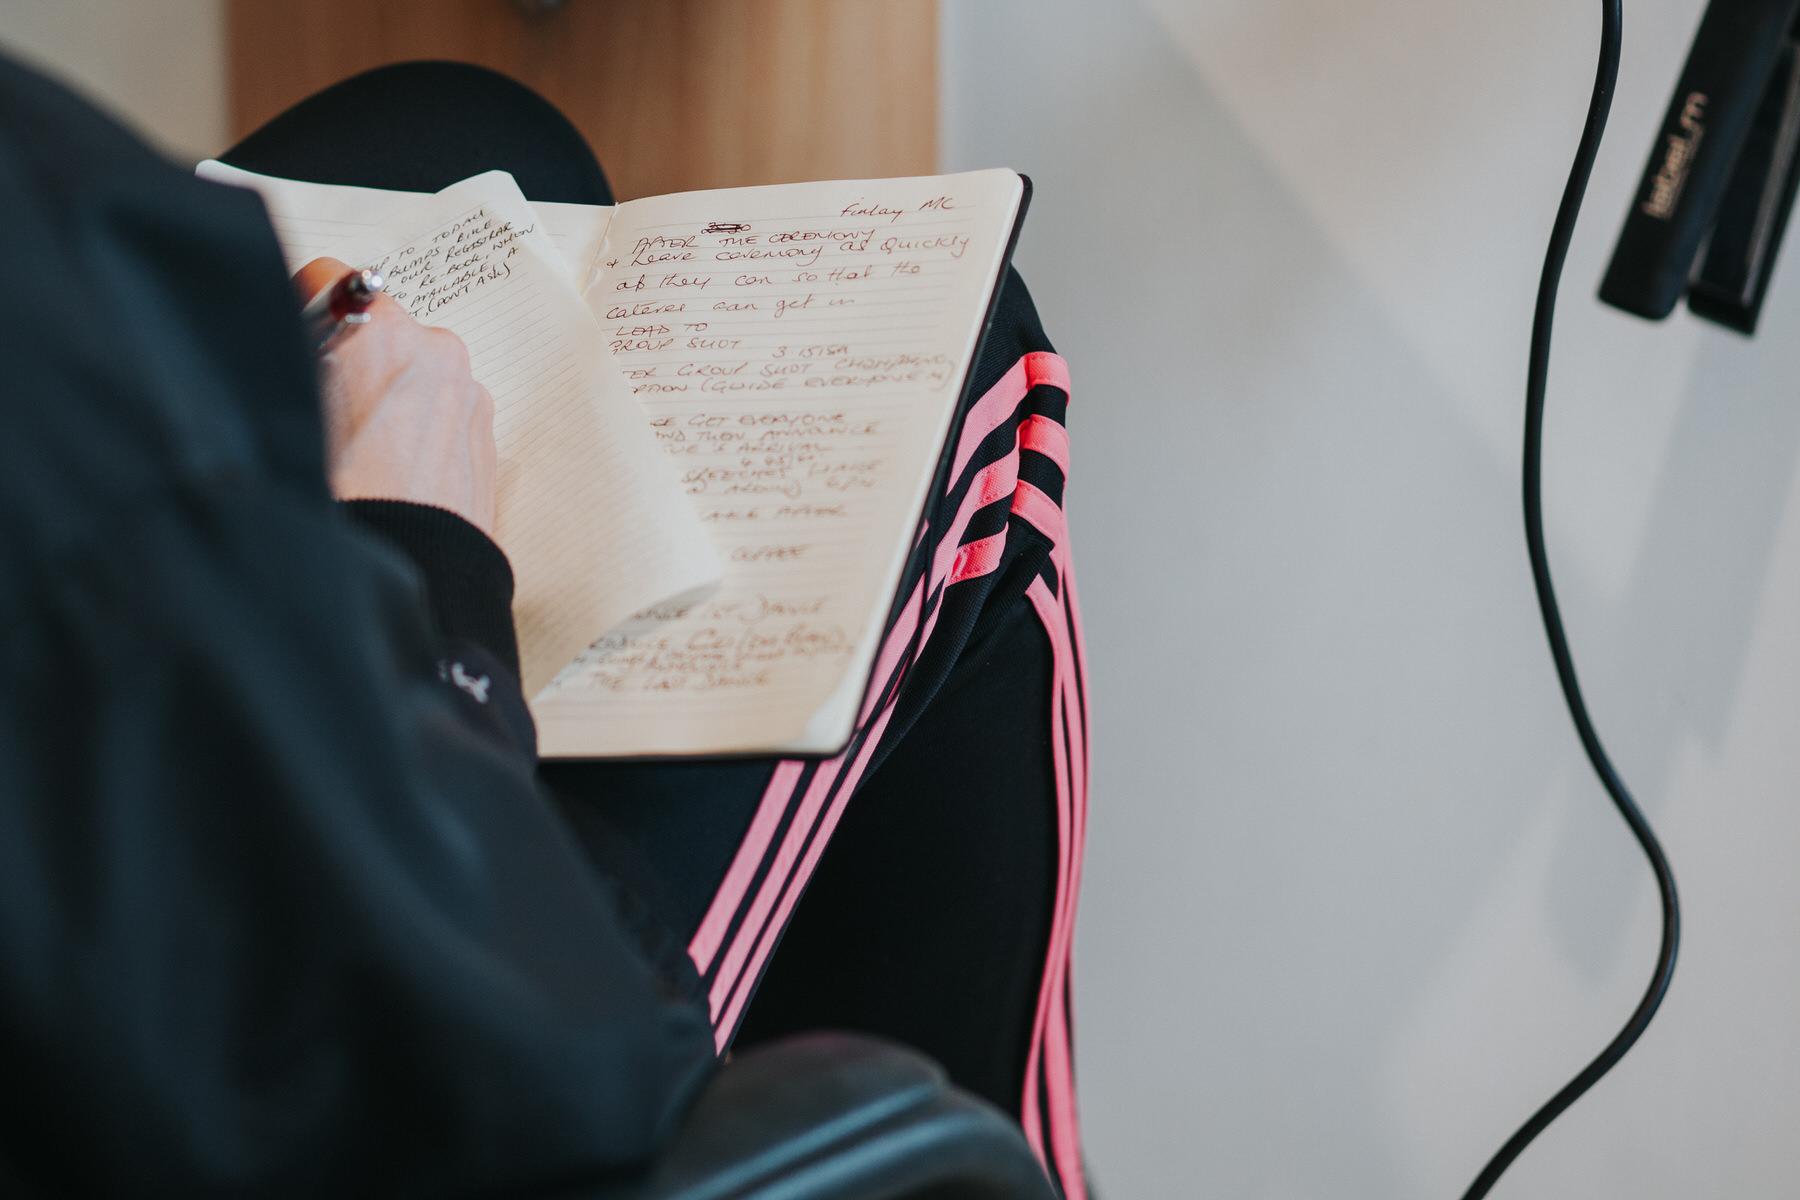 5 bride writing wedding vow notes.jpg